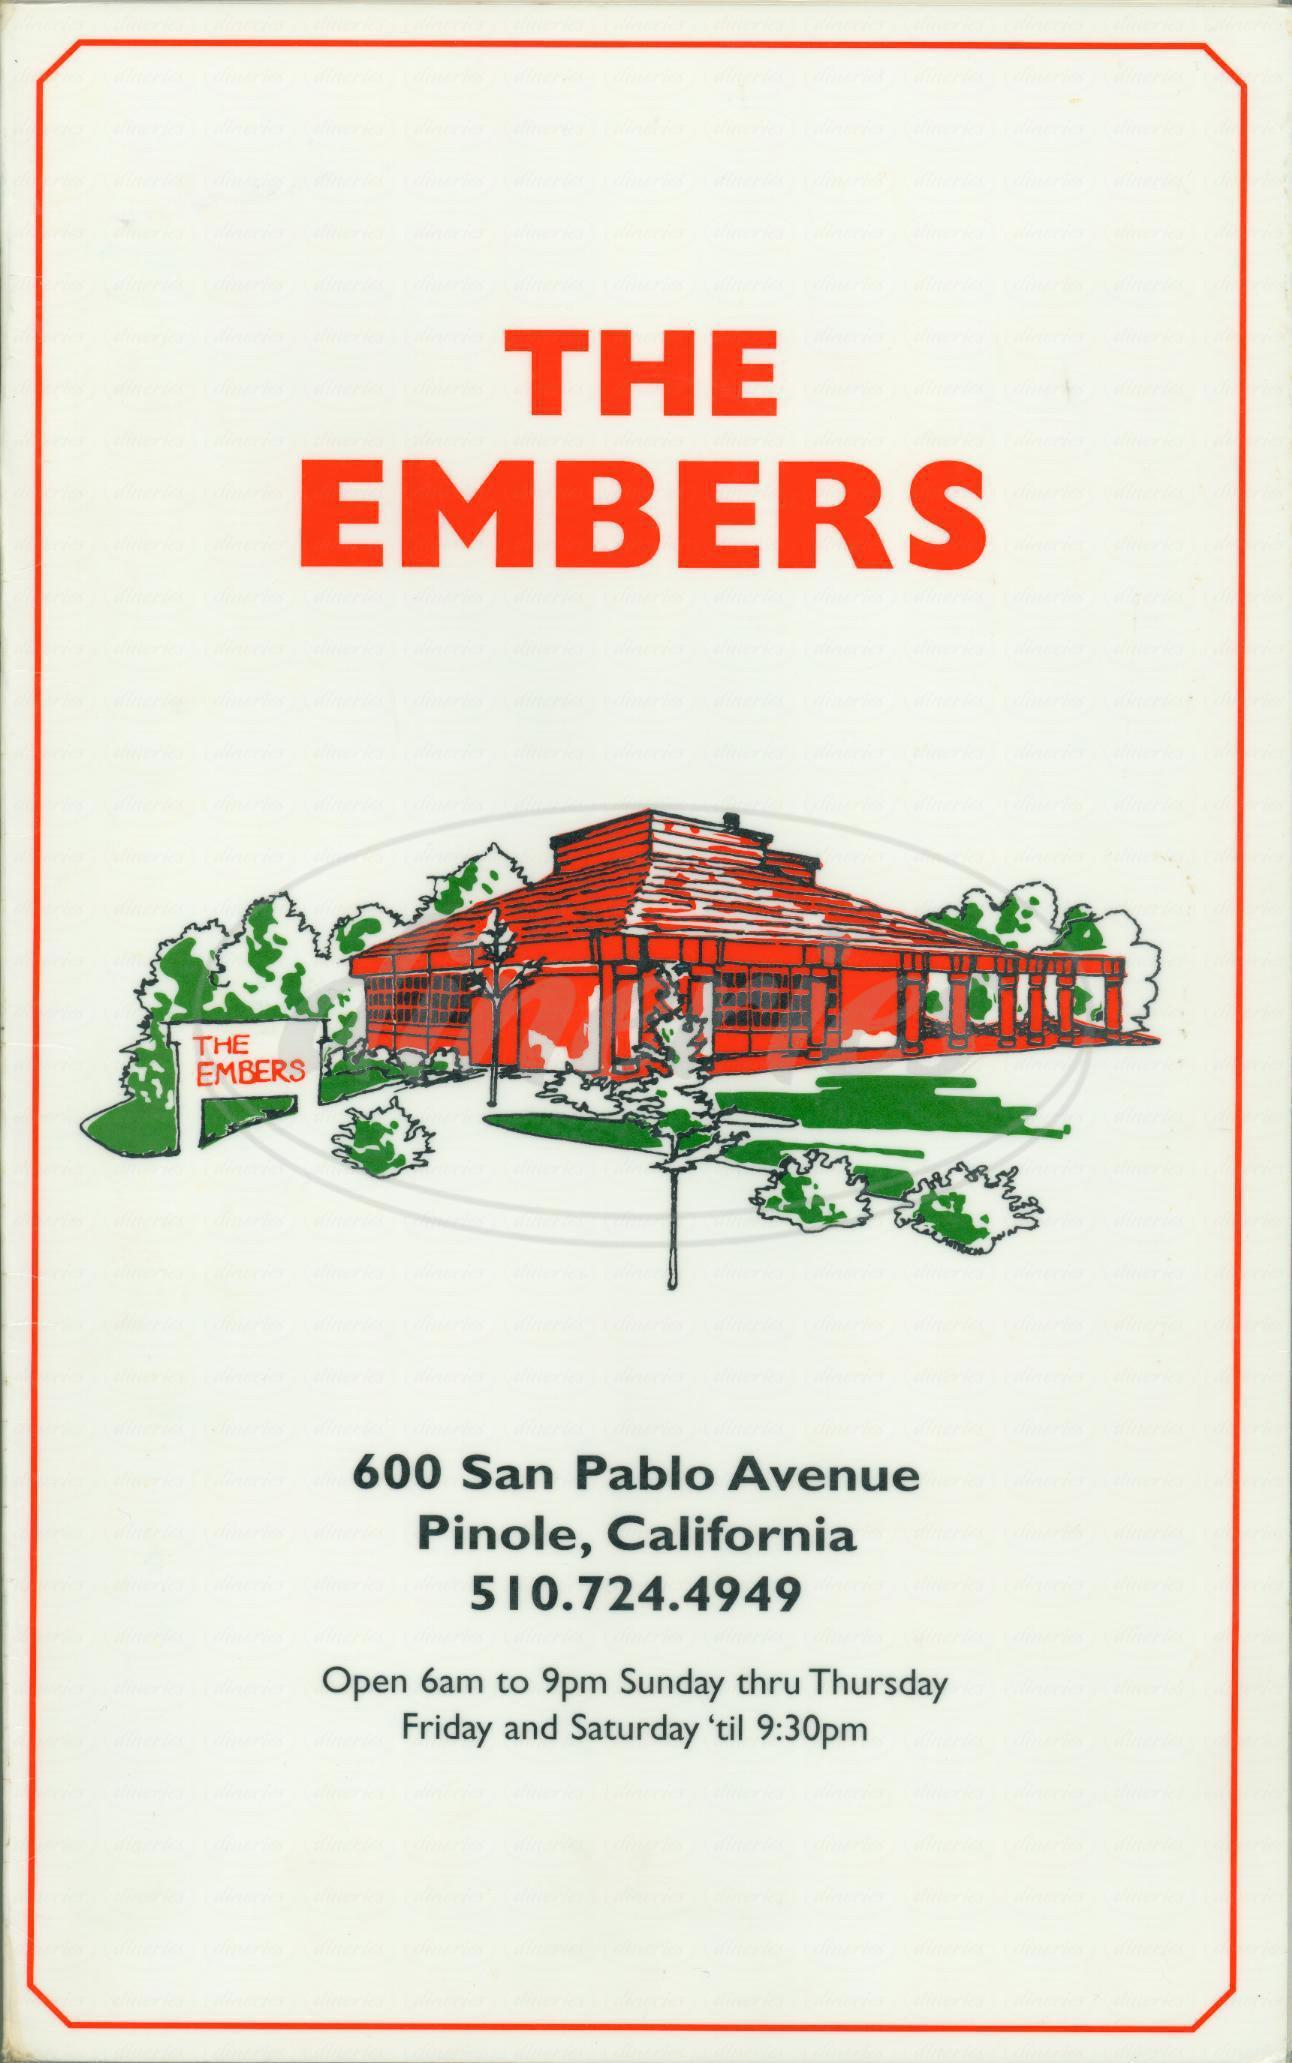 menu for The Embers